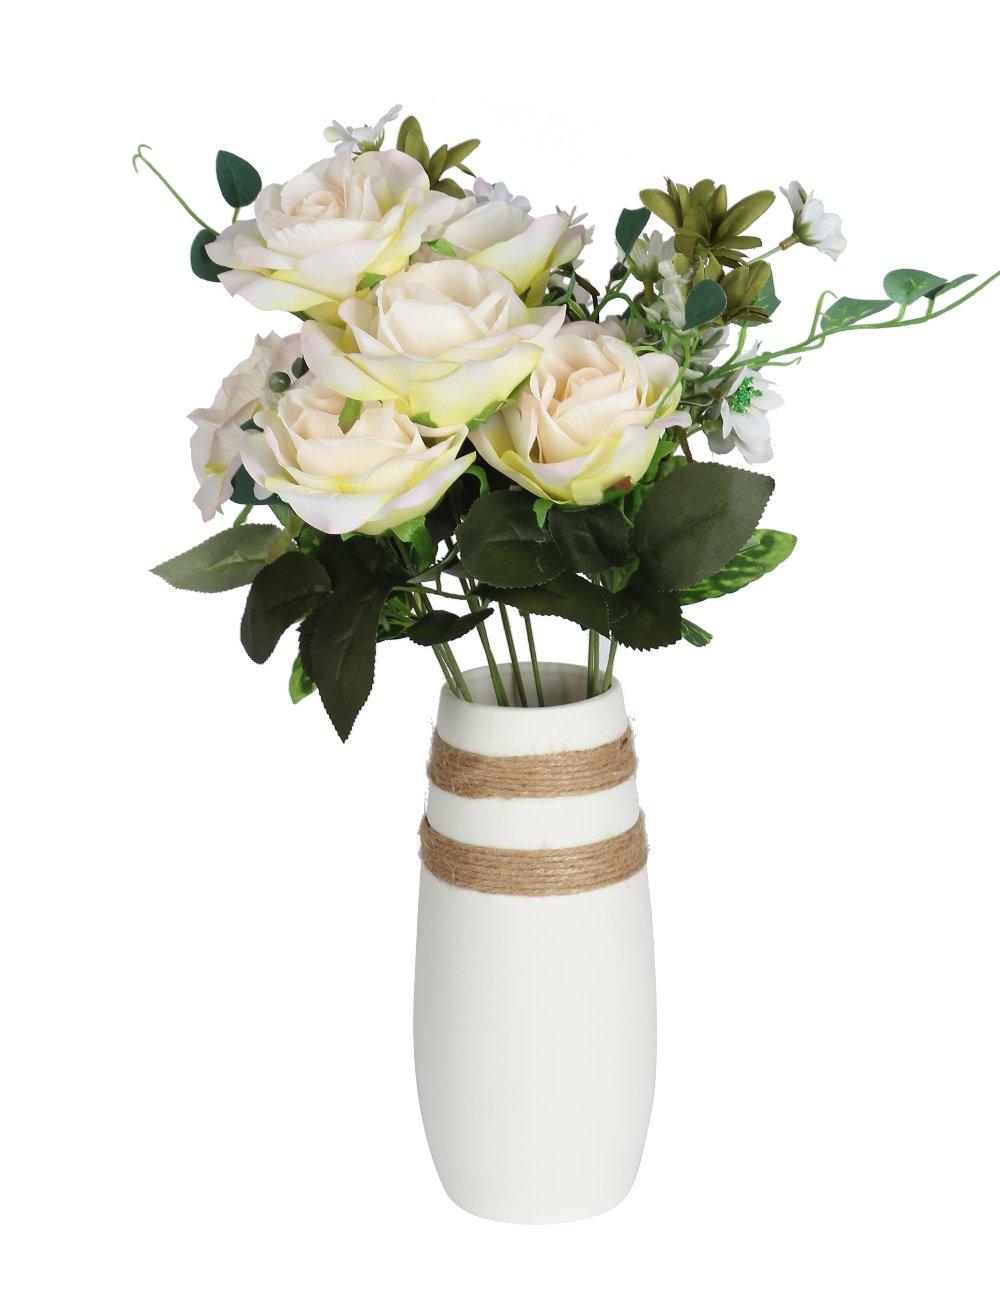 Caeser Archy White Flower Vase Handmade Modern Ceramic Vase Round Unique Rope Design for Home Decor Living Room, Office and Wedding(H8.6'' D2.9'') E-UK1801WCV01